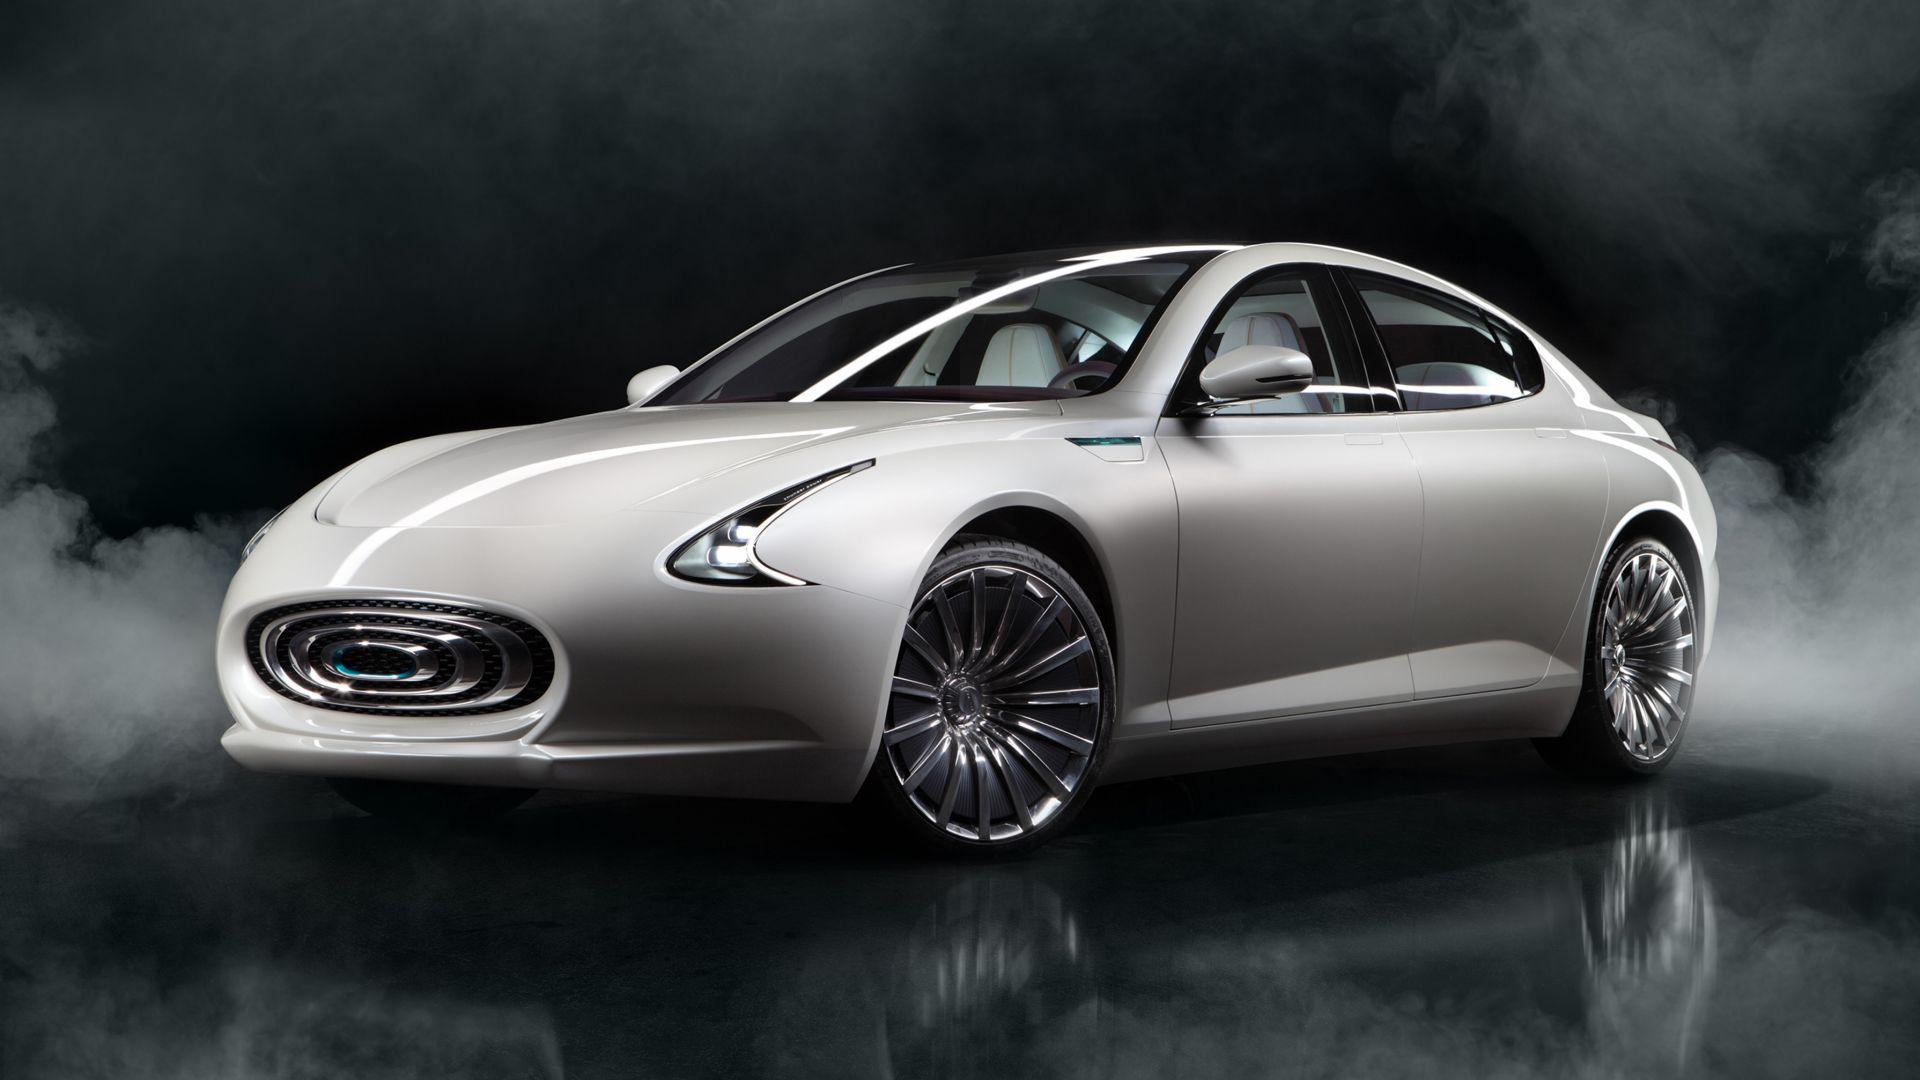 wallpaper thunder power sedan electric cars luxury cars cars bikes 7487. Black Bedroom Furniture Sets. Home Design Ideas